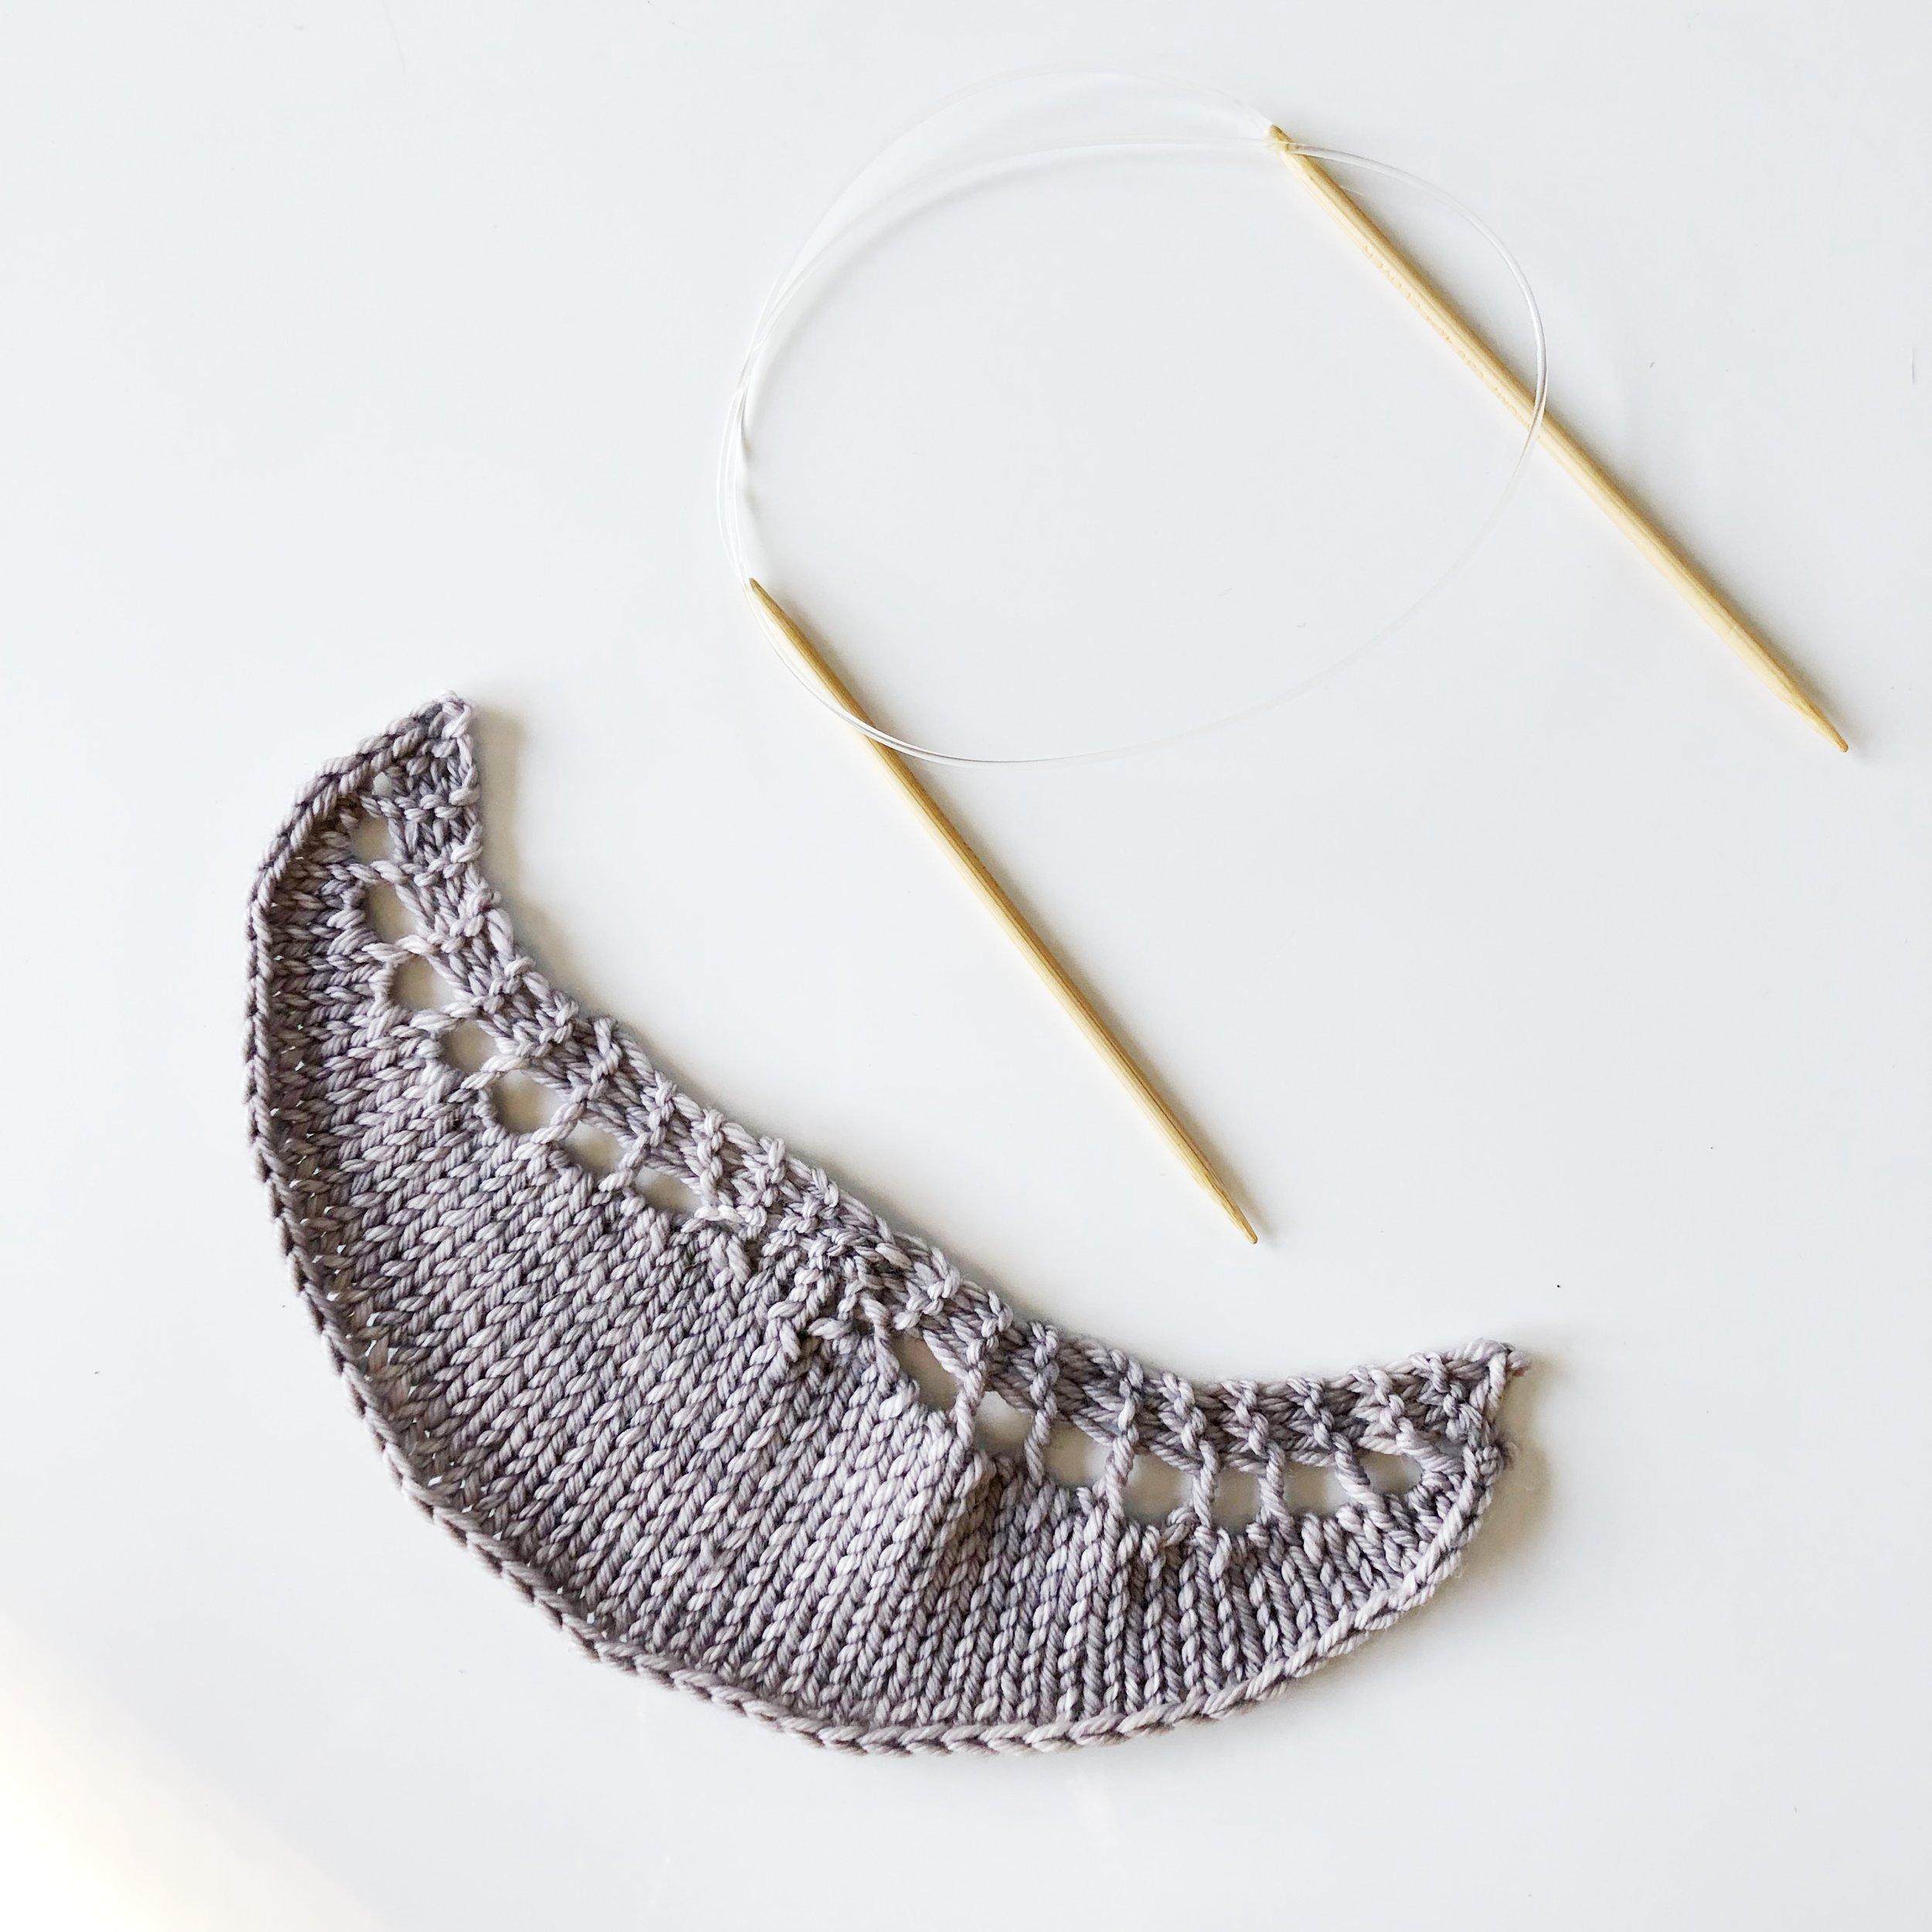 aroha-knits-5-shawls-5-days-challenge-day-2-crescent-shawl-in-malabrigo-rios-pearl-knitting-elisemade